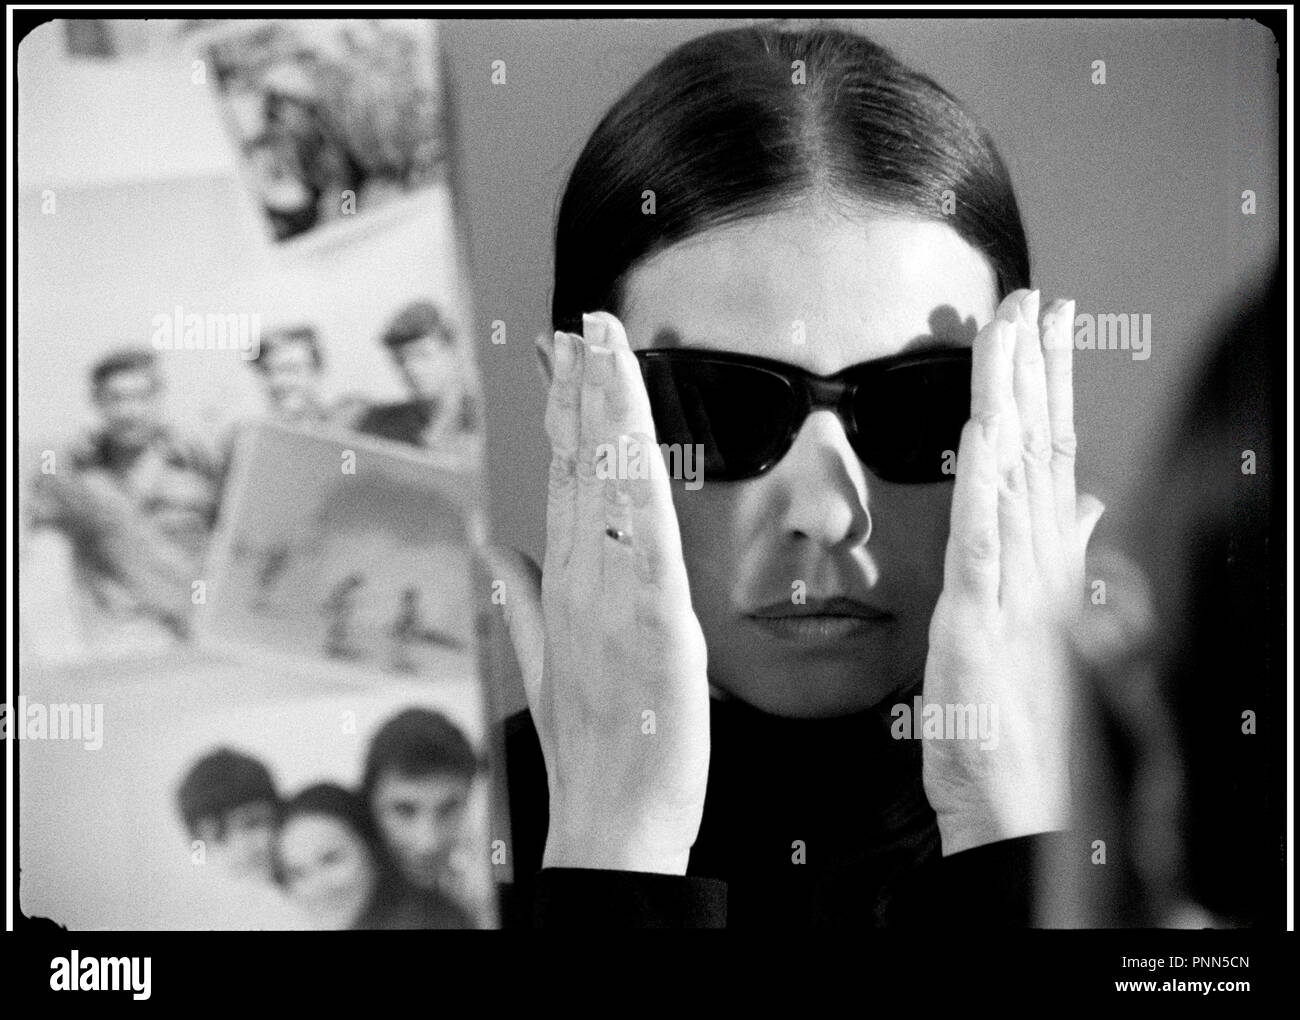 Prod DB © Siege Films Ltd. / DR MATZOR de Gilberto Tofano 1969 ISR. avec Gila Almagor Stock Photo